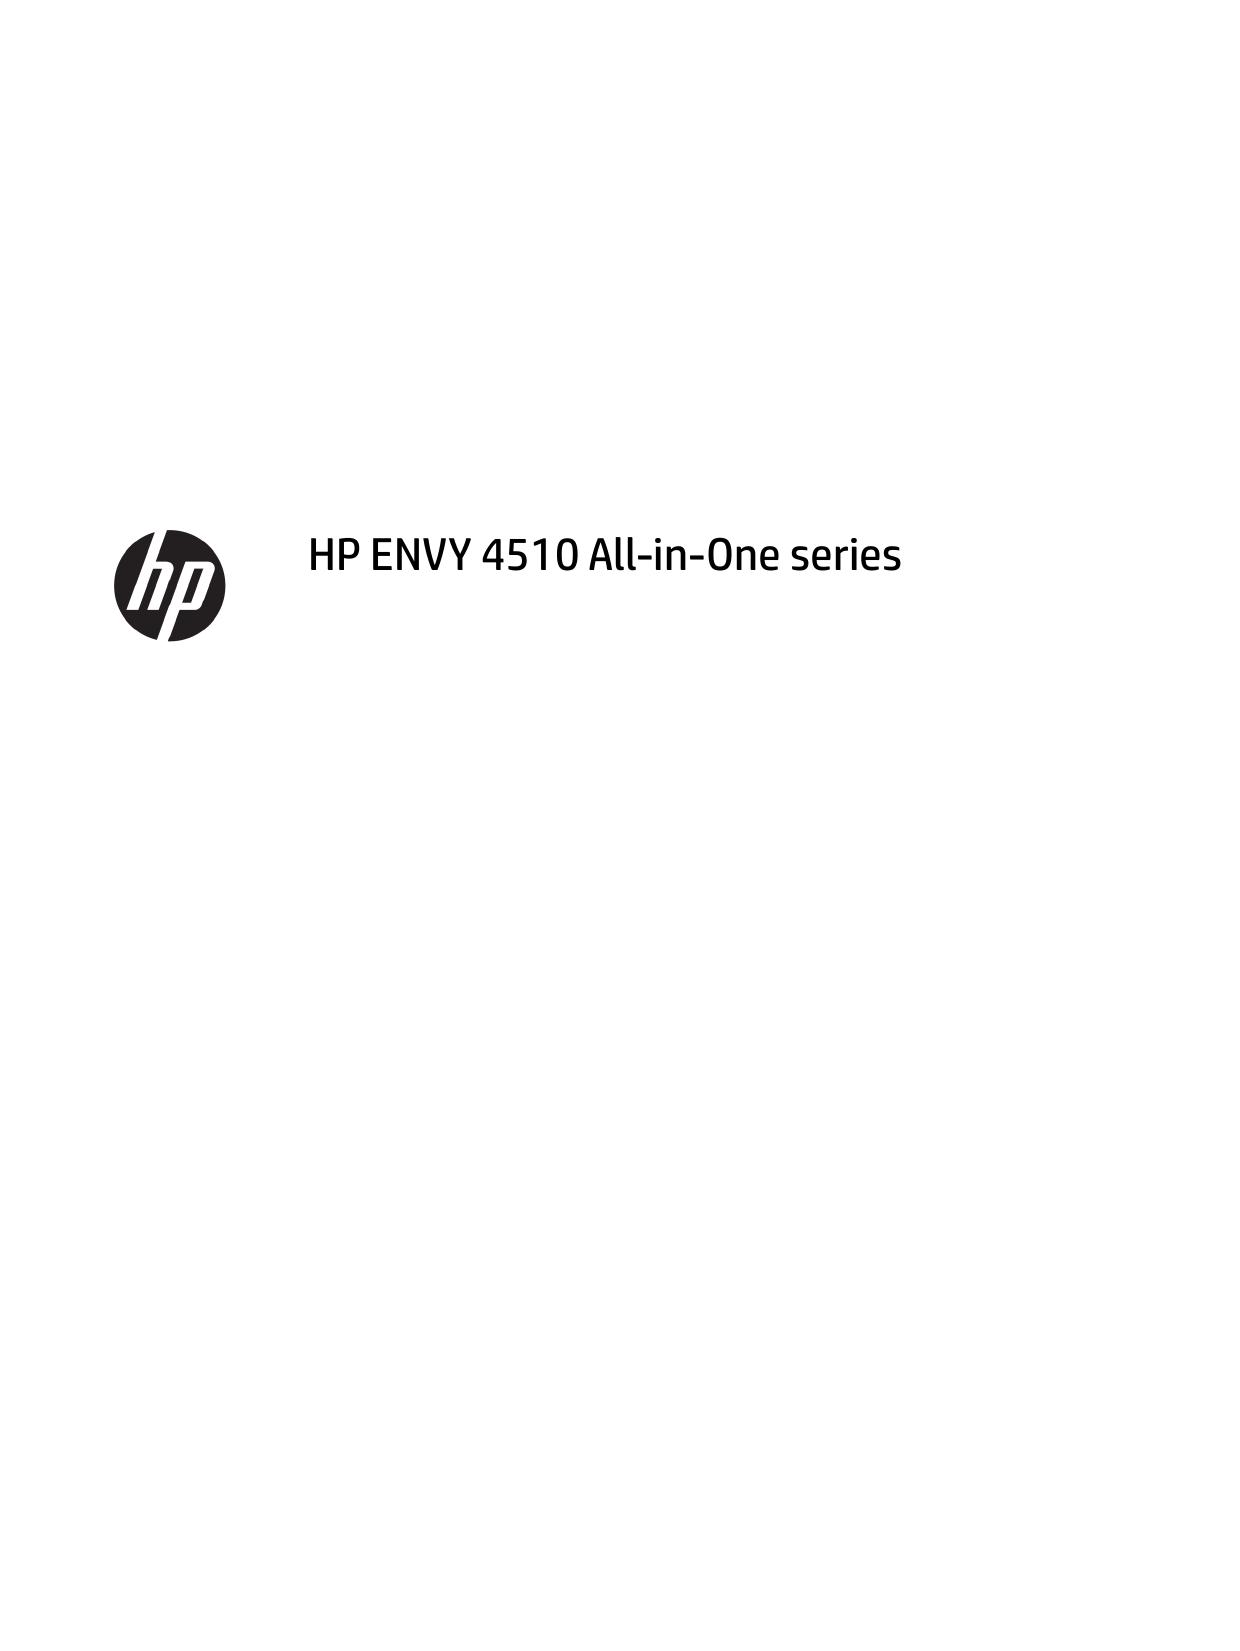 Hp Envy 4512 All In One Printer User Guide Manualzz Com